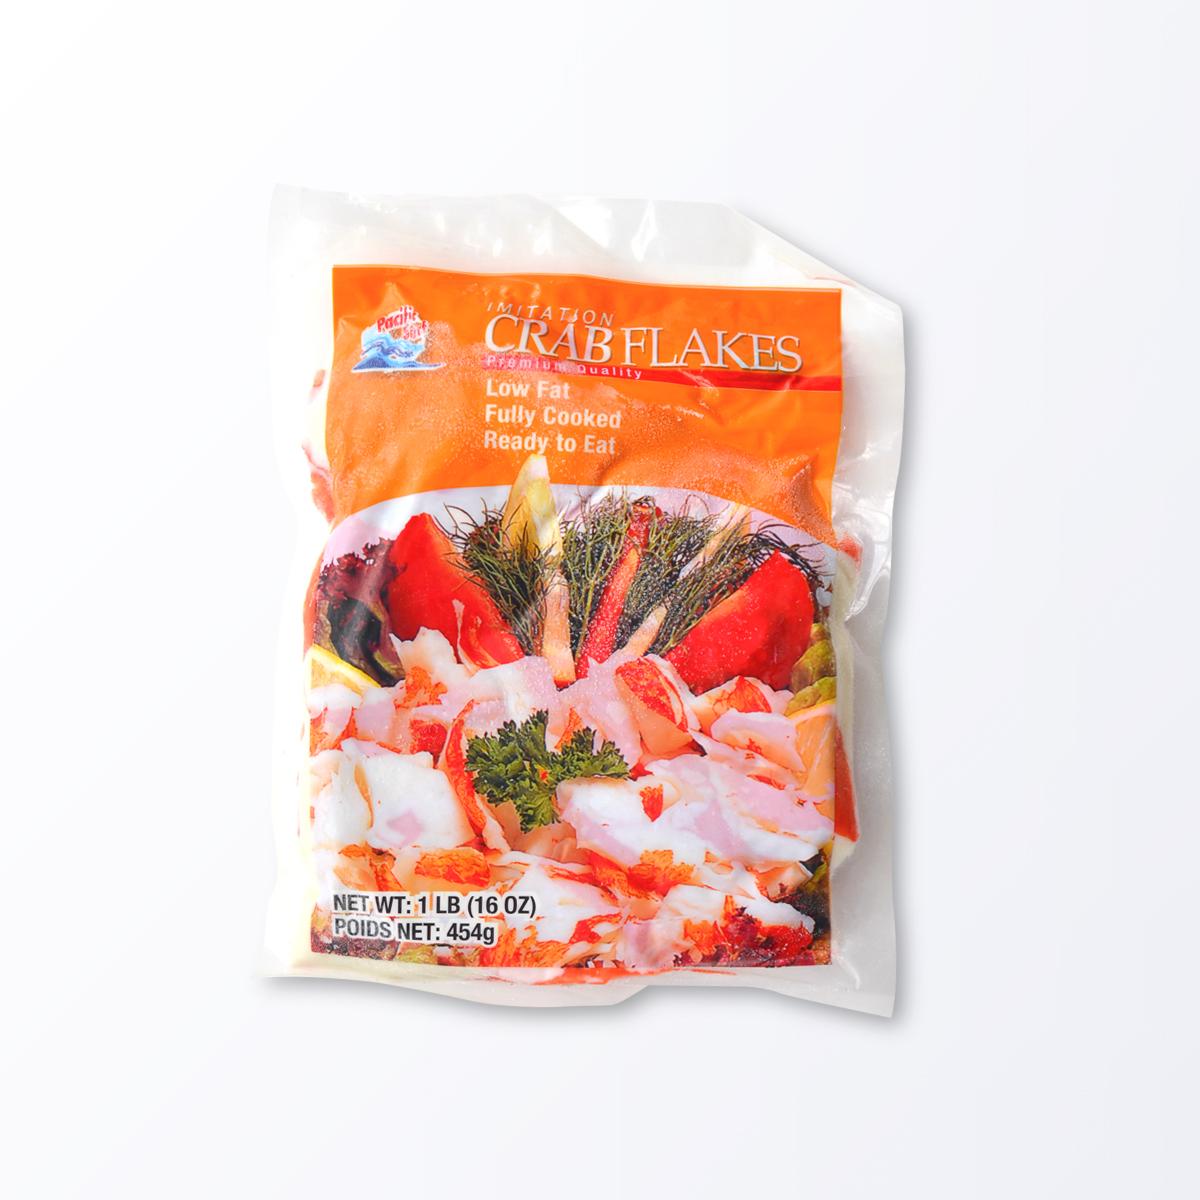 IMI109-Imitation-Crab-Flake.jpg